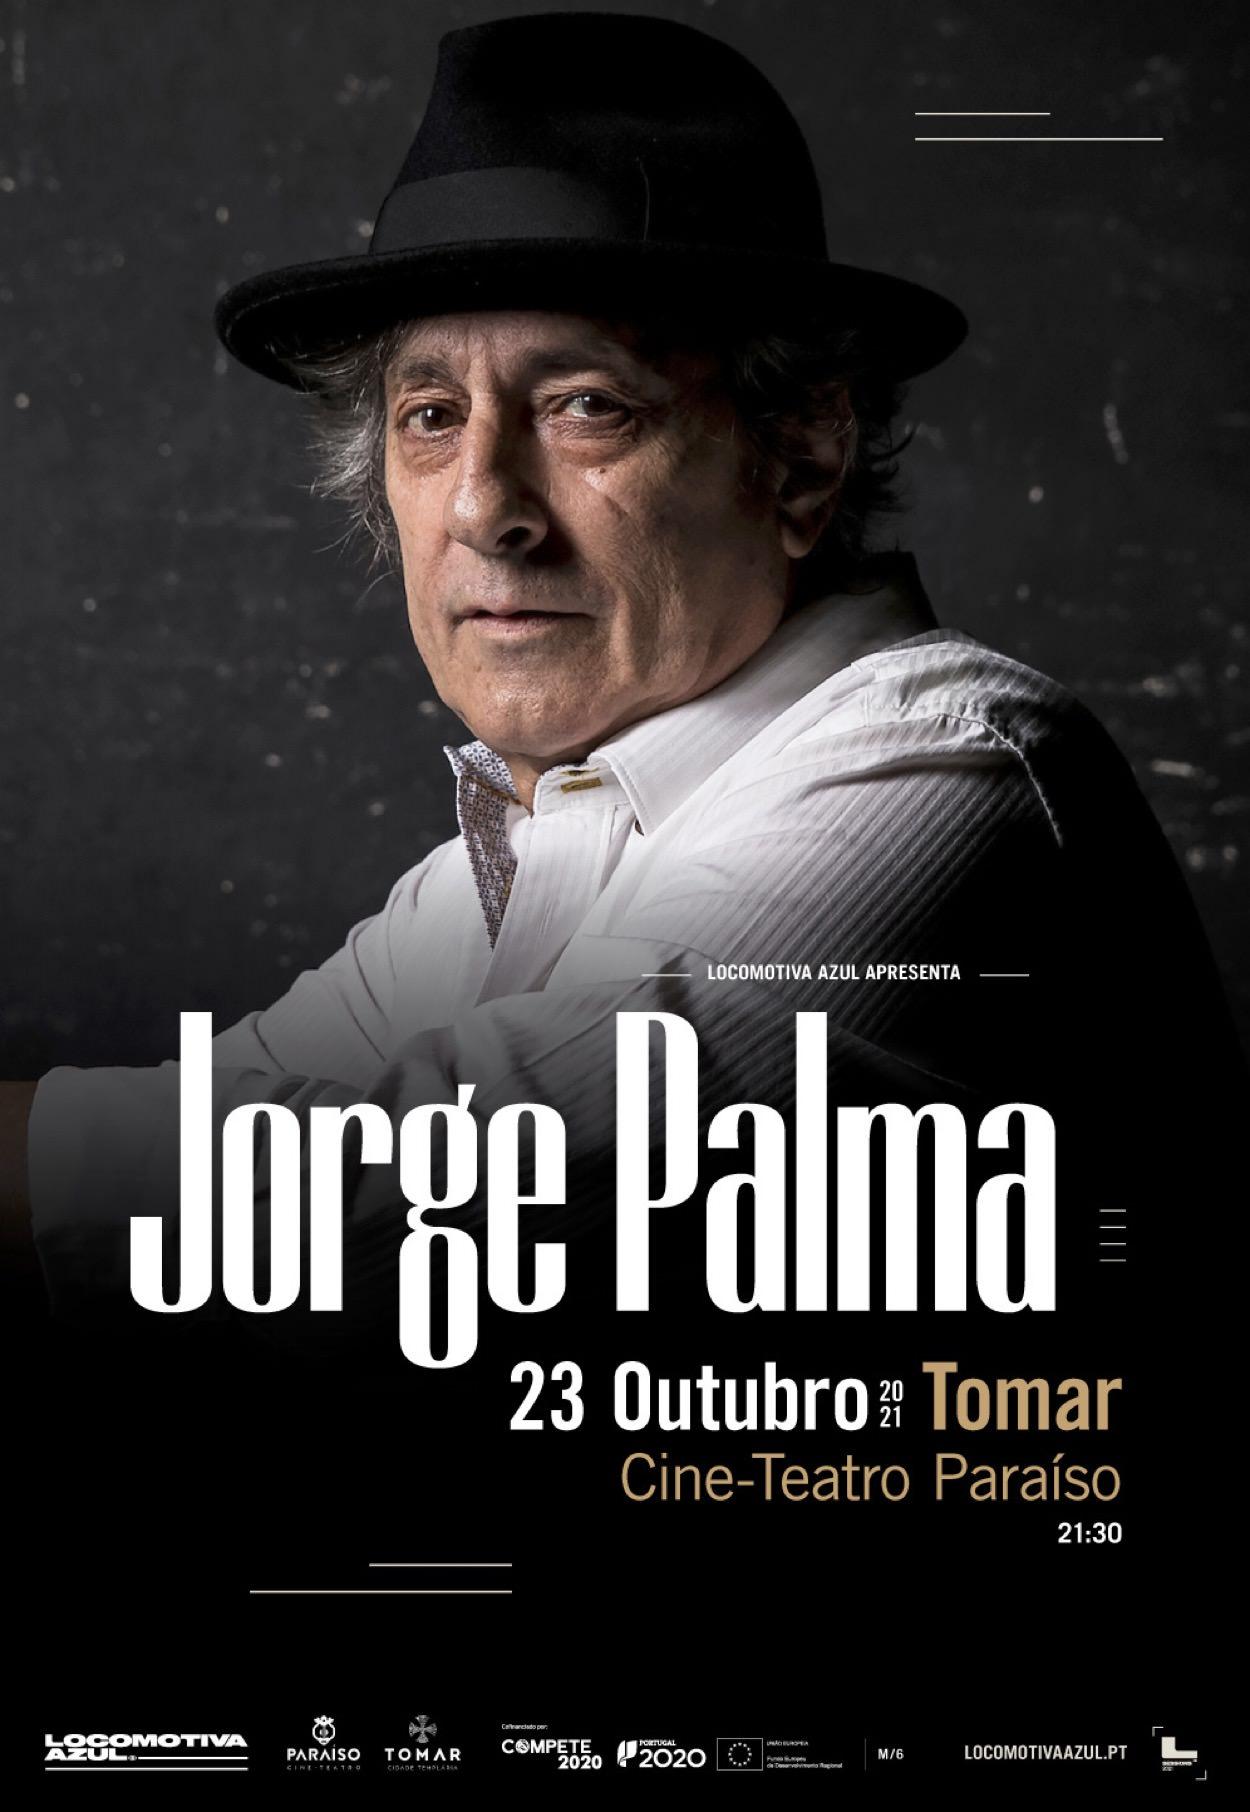 Jorge Palma, Tomar